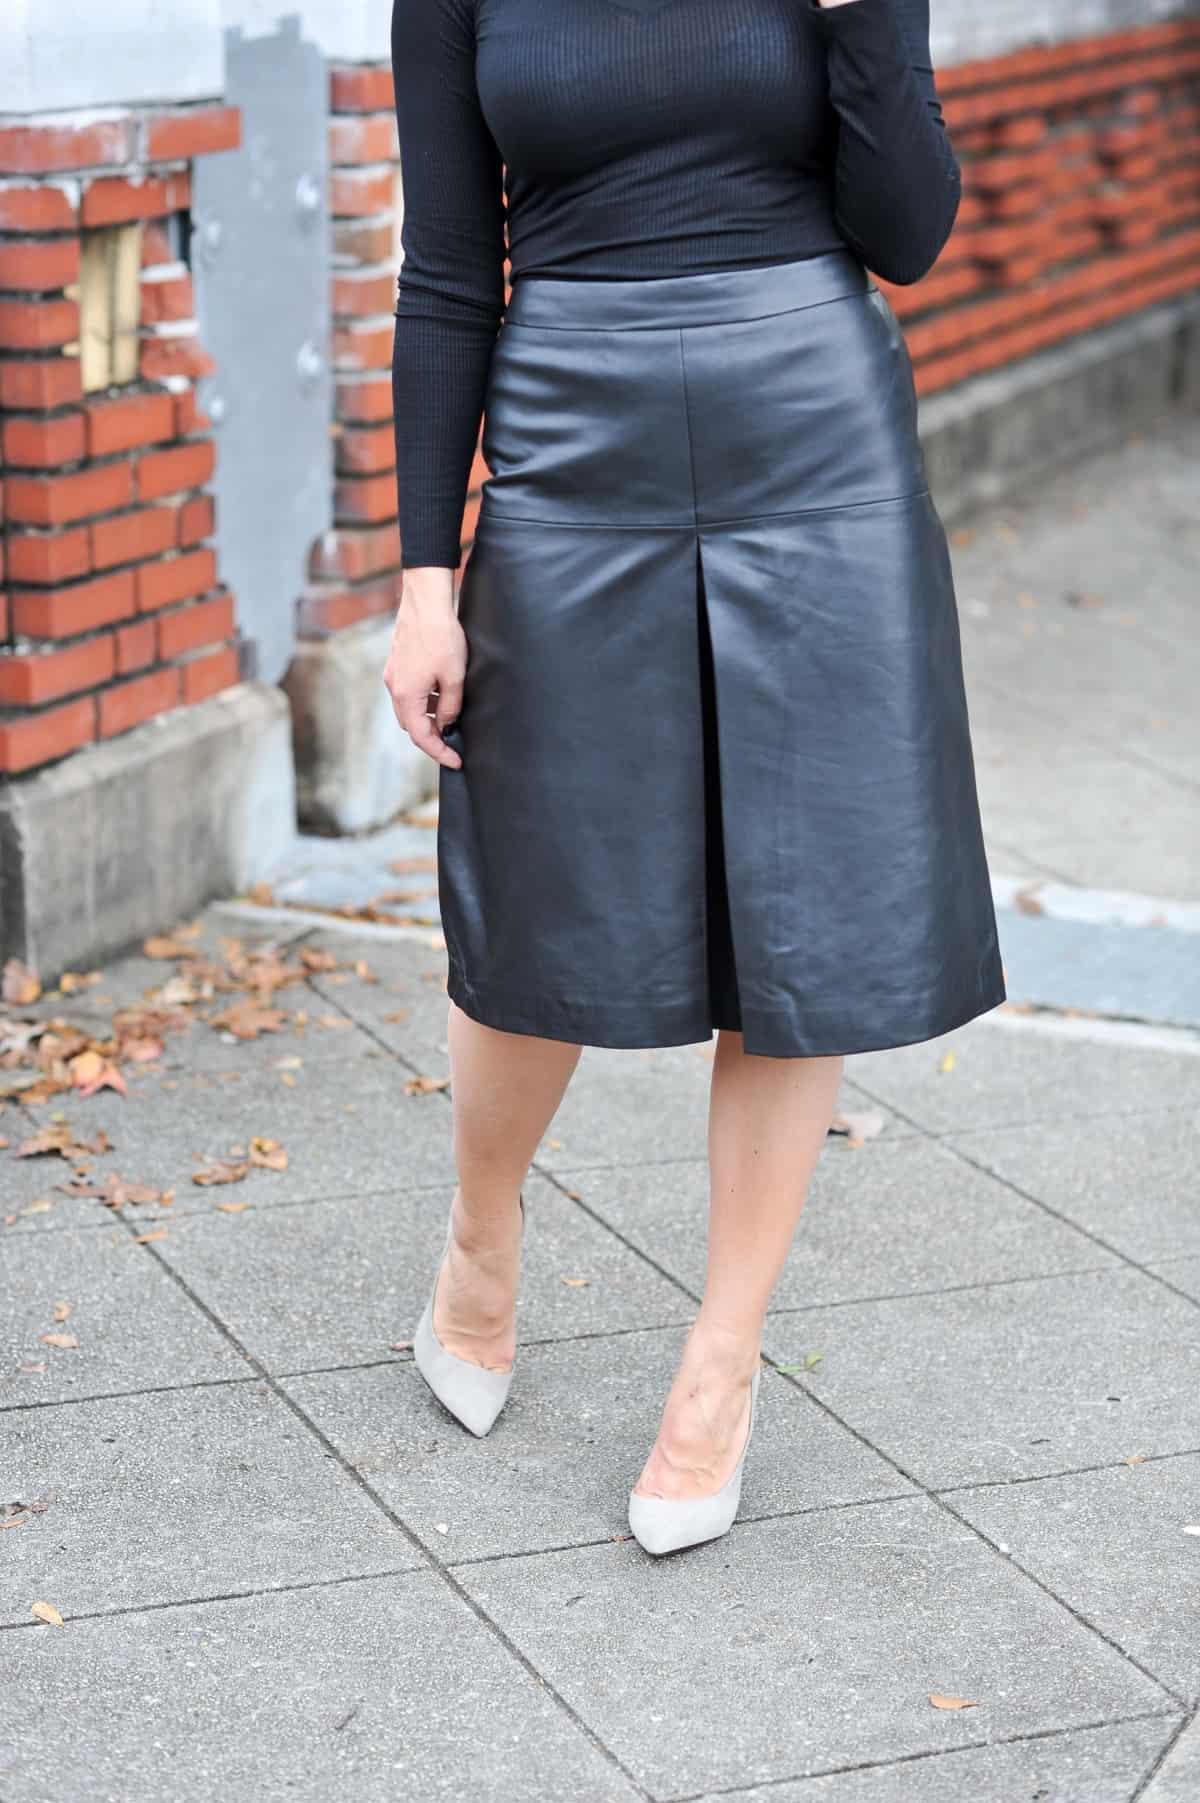 Leather A-Line midi skirt, all black outfit ideas via @mystylevita